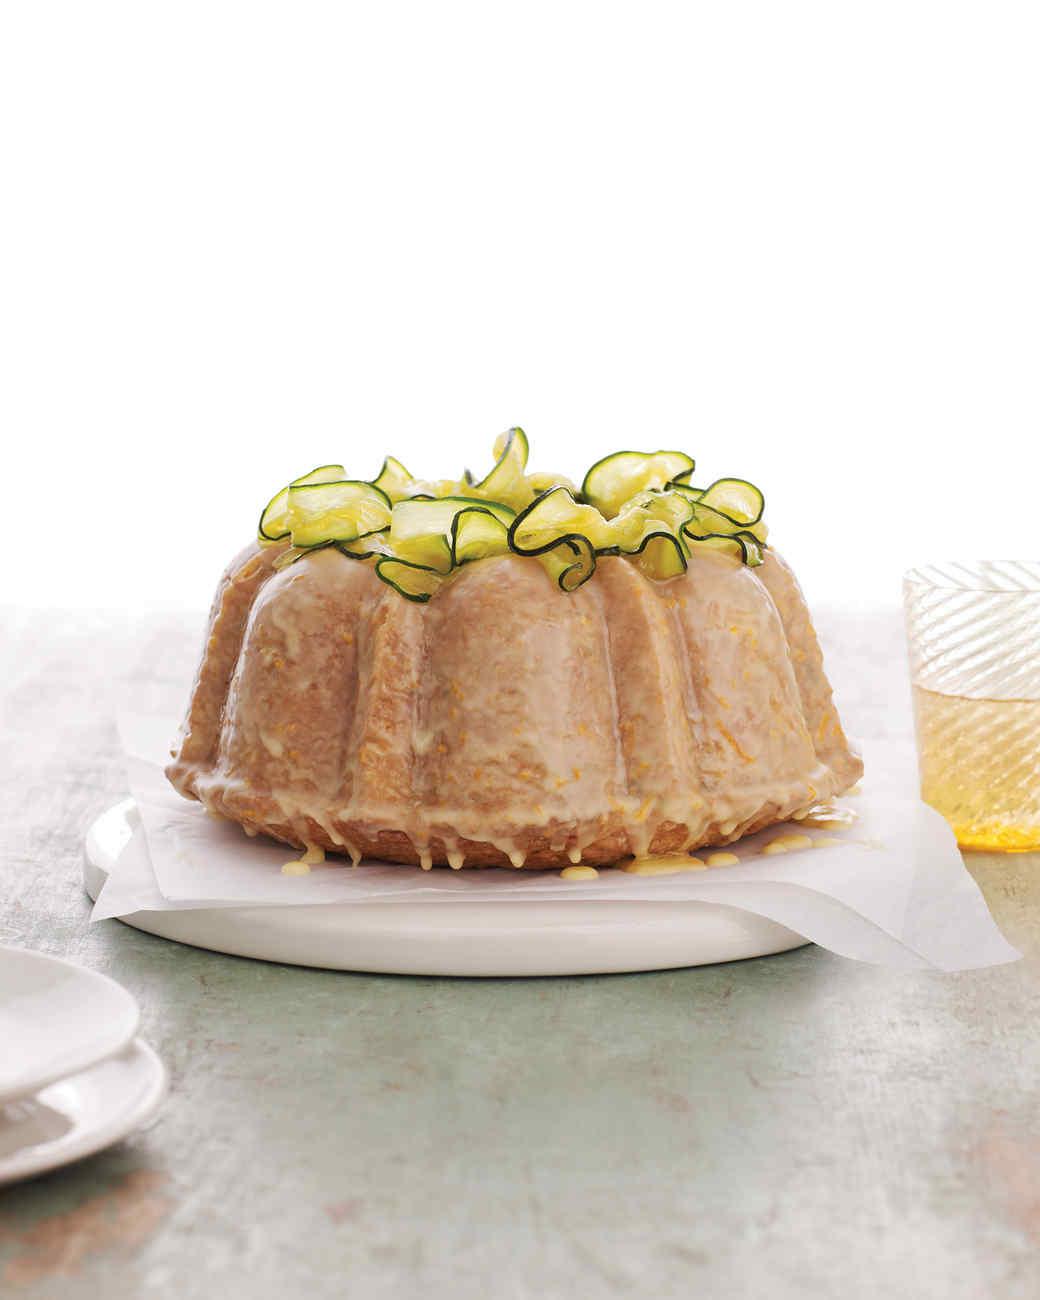 zucchini-bundt-cake-mld107419.jpg